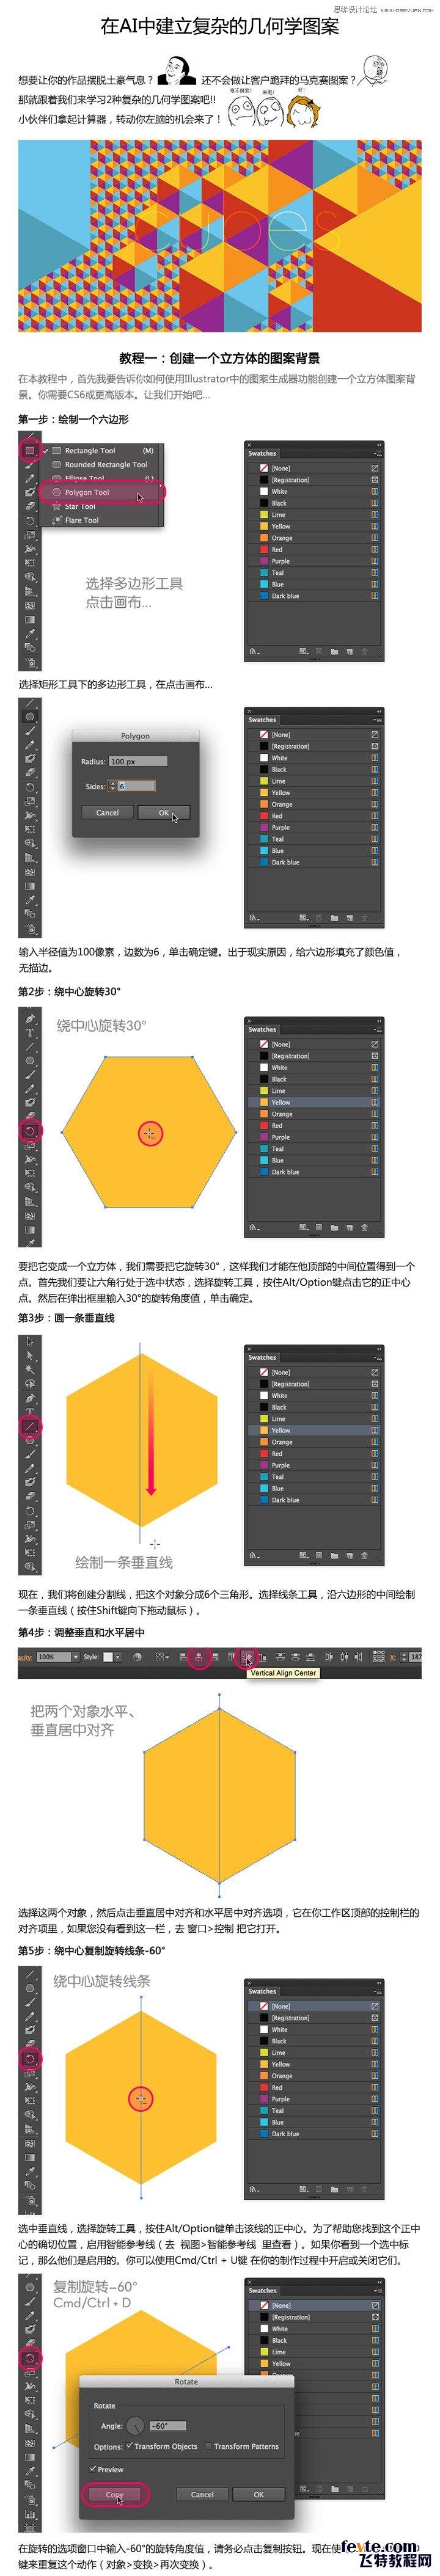 Illustrator制作漂亮几何形状背景教程